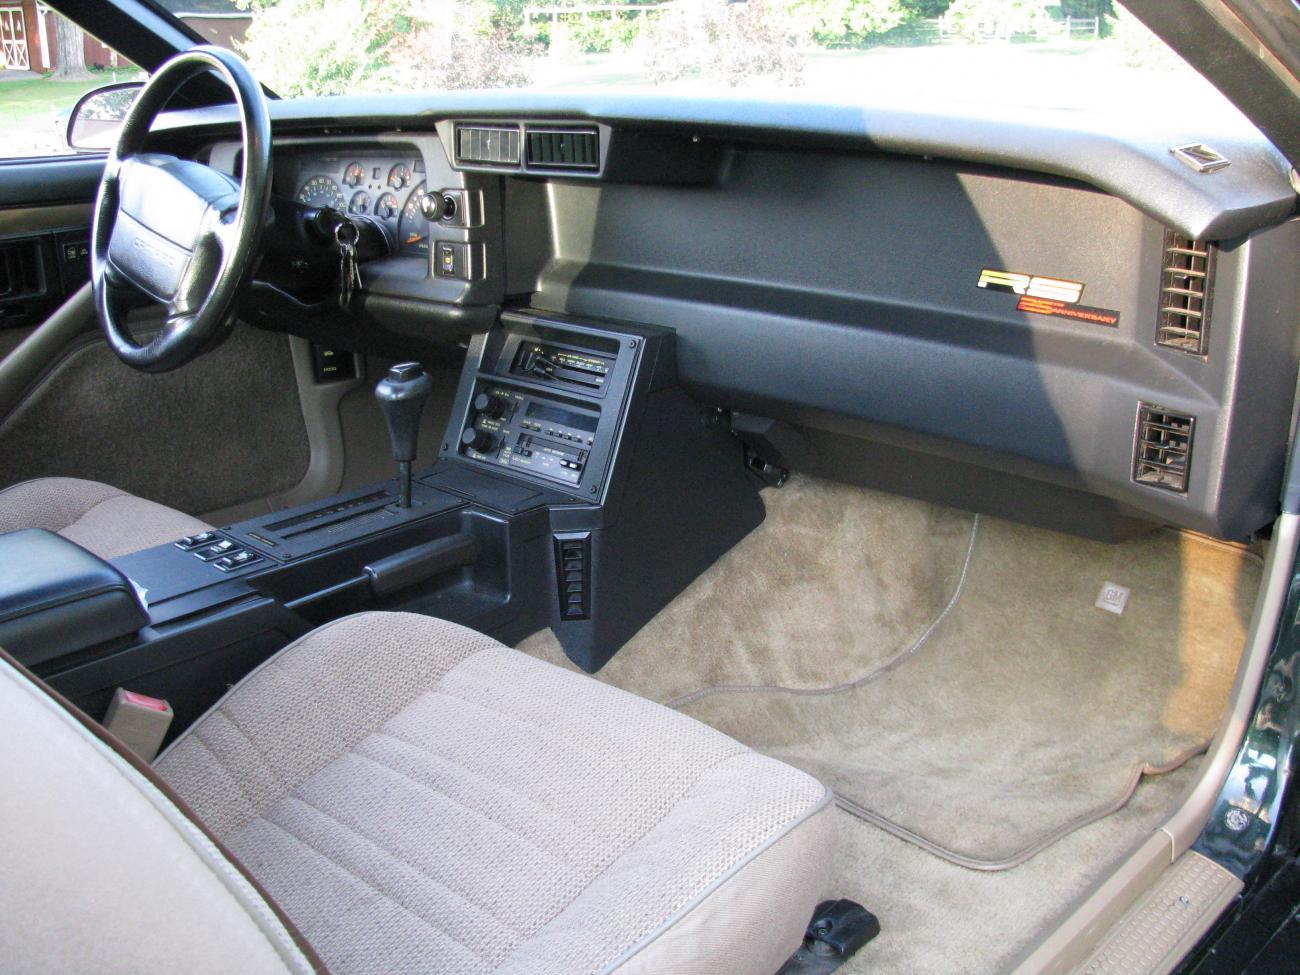 1992 camaro rs 25th anniversary edition camaro5 chevy for Interior 86 camaro